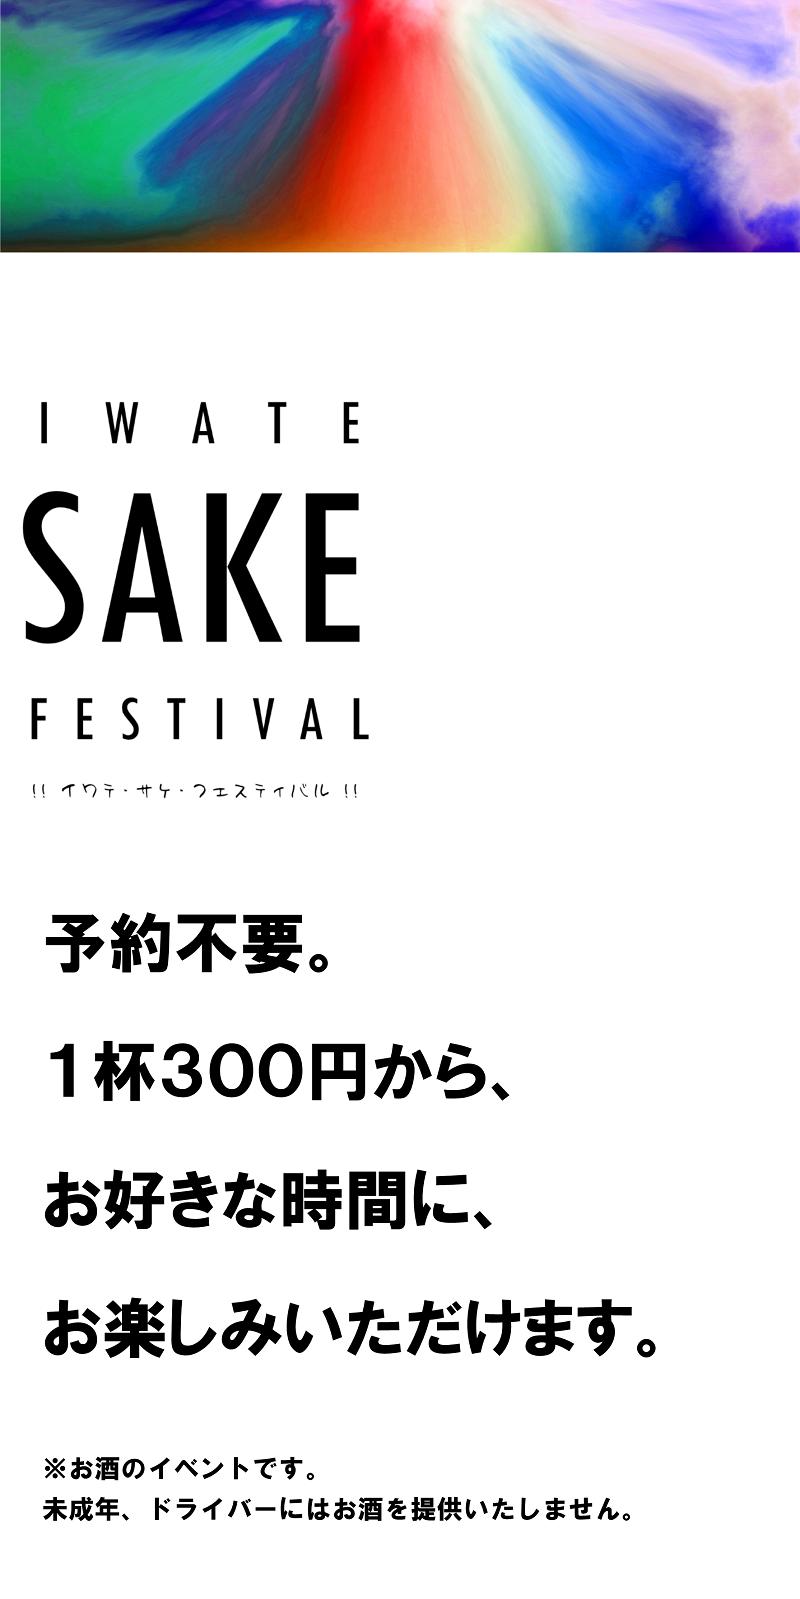 IwateSakeFestival2019_lp3